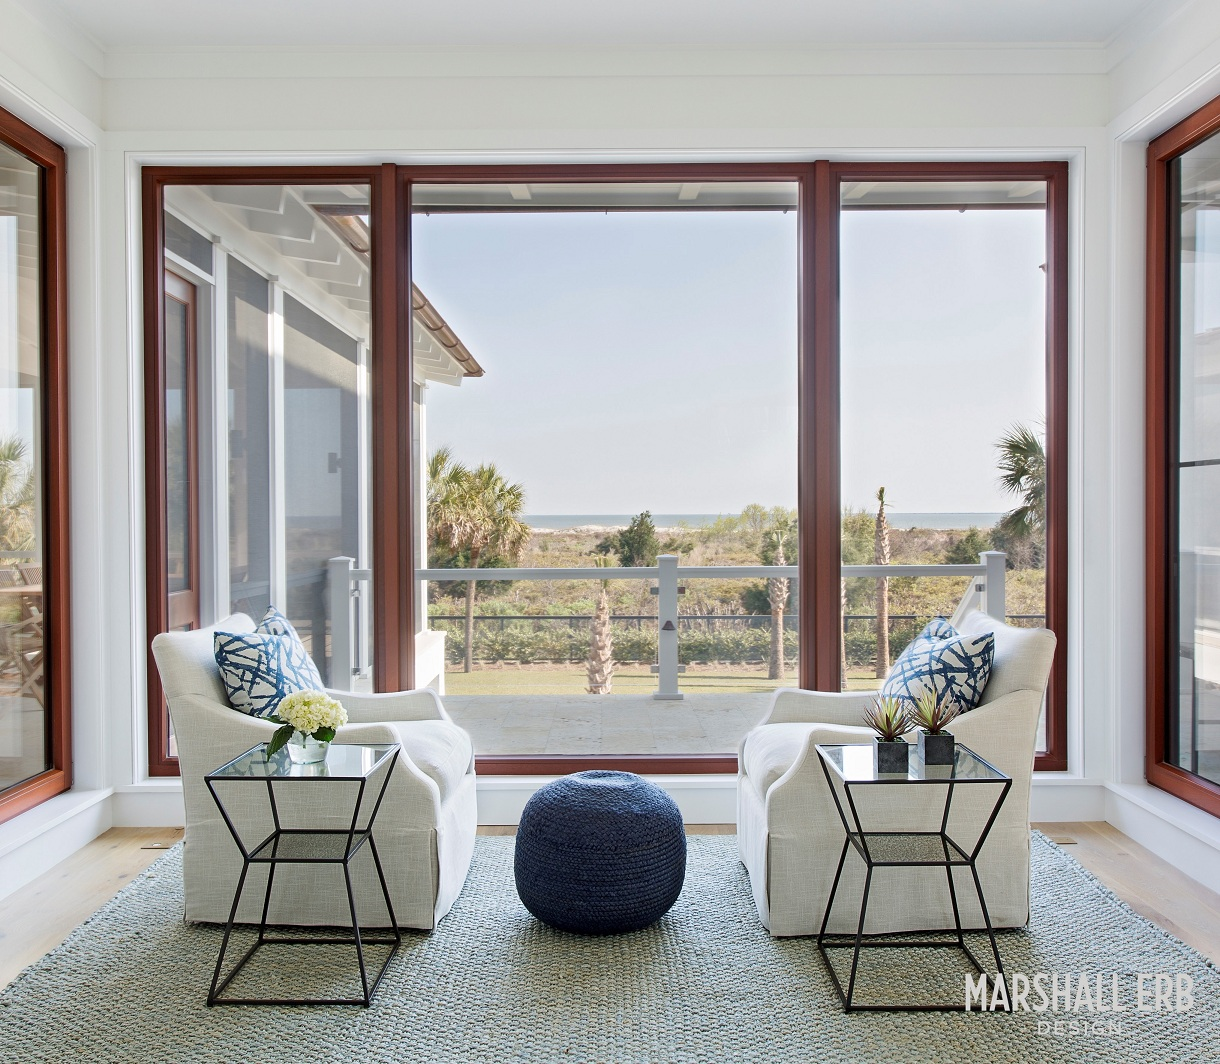 Marshall-Erb-Design-Beach-House-Living2